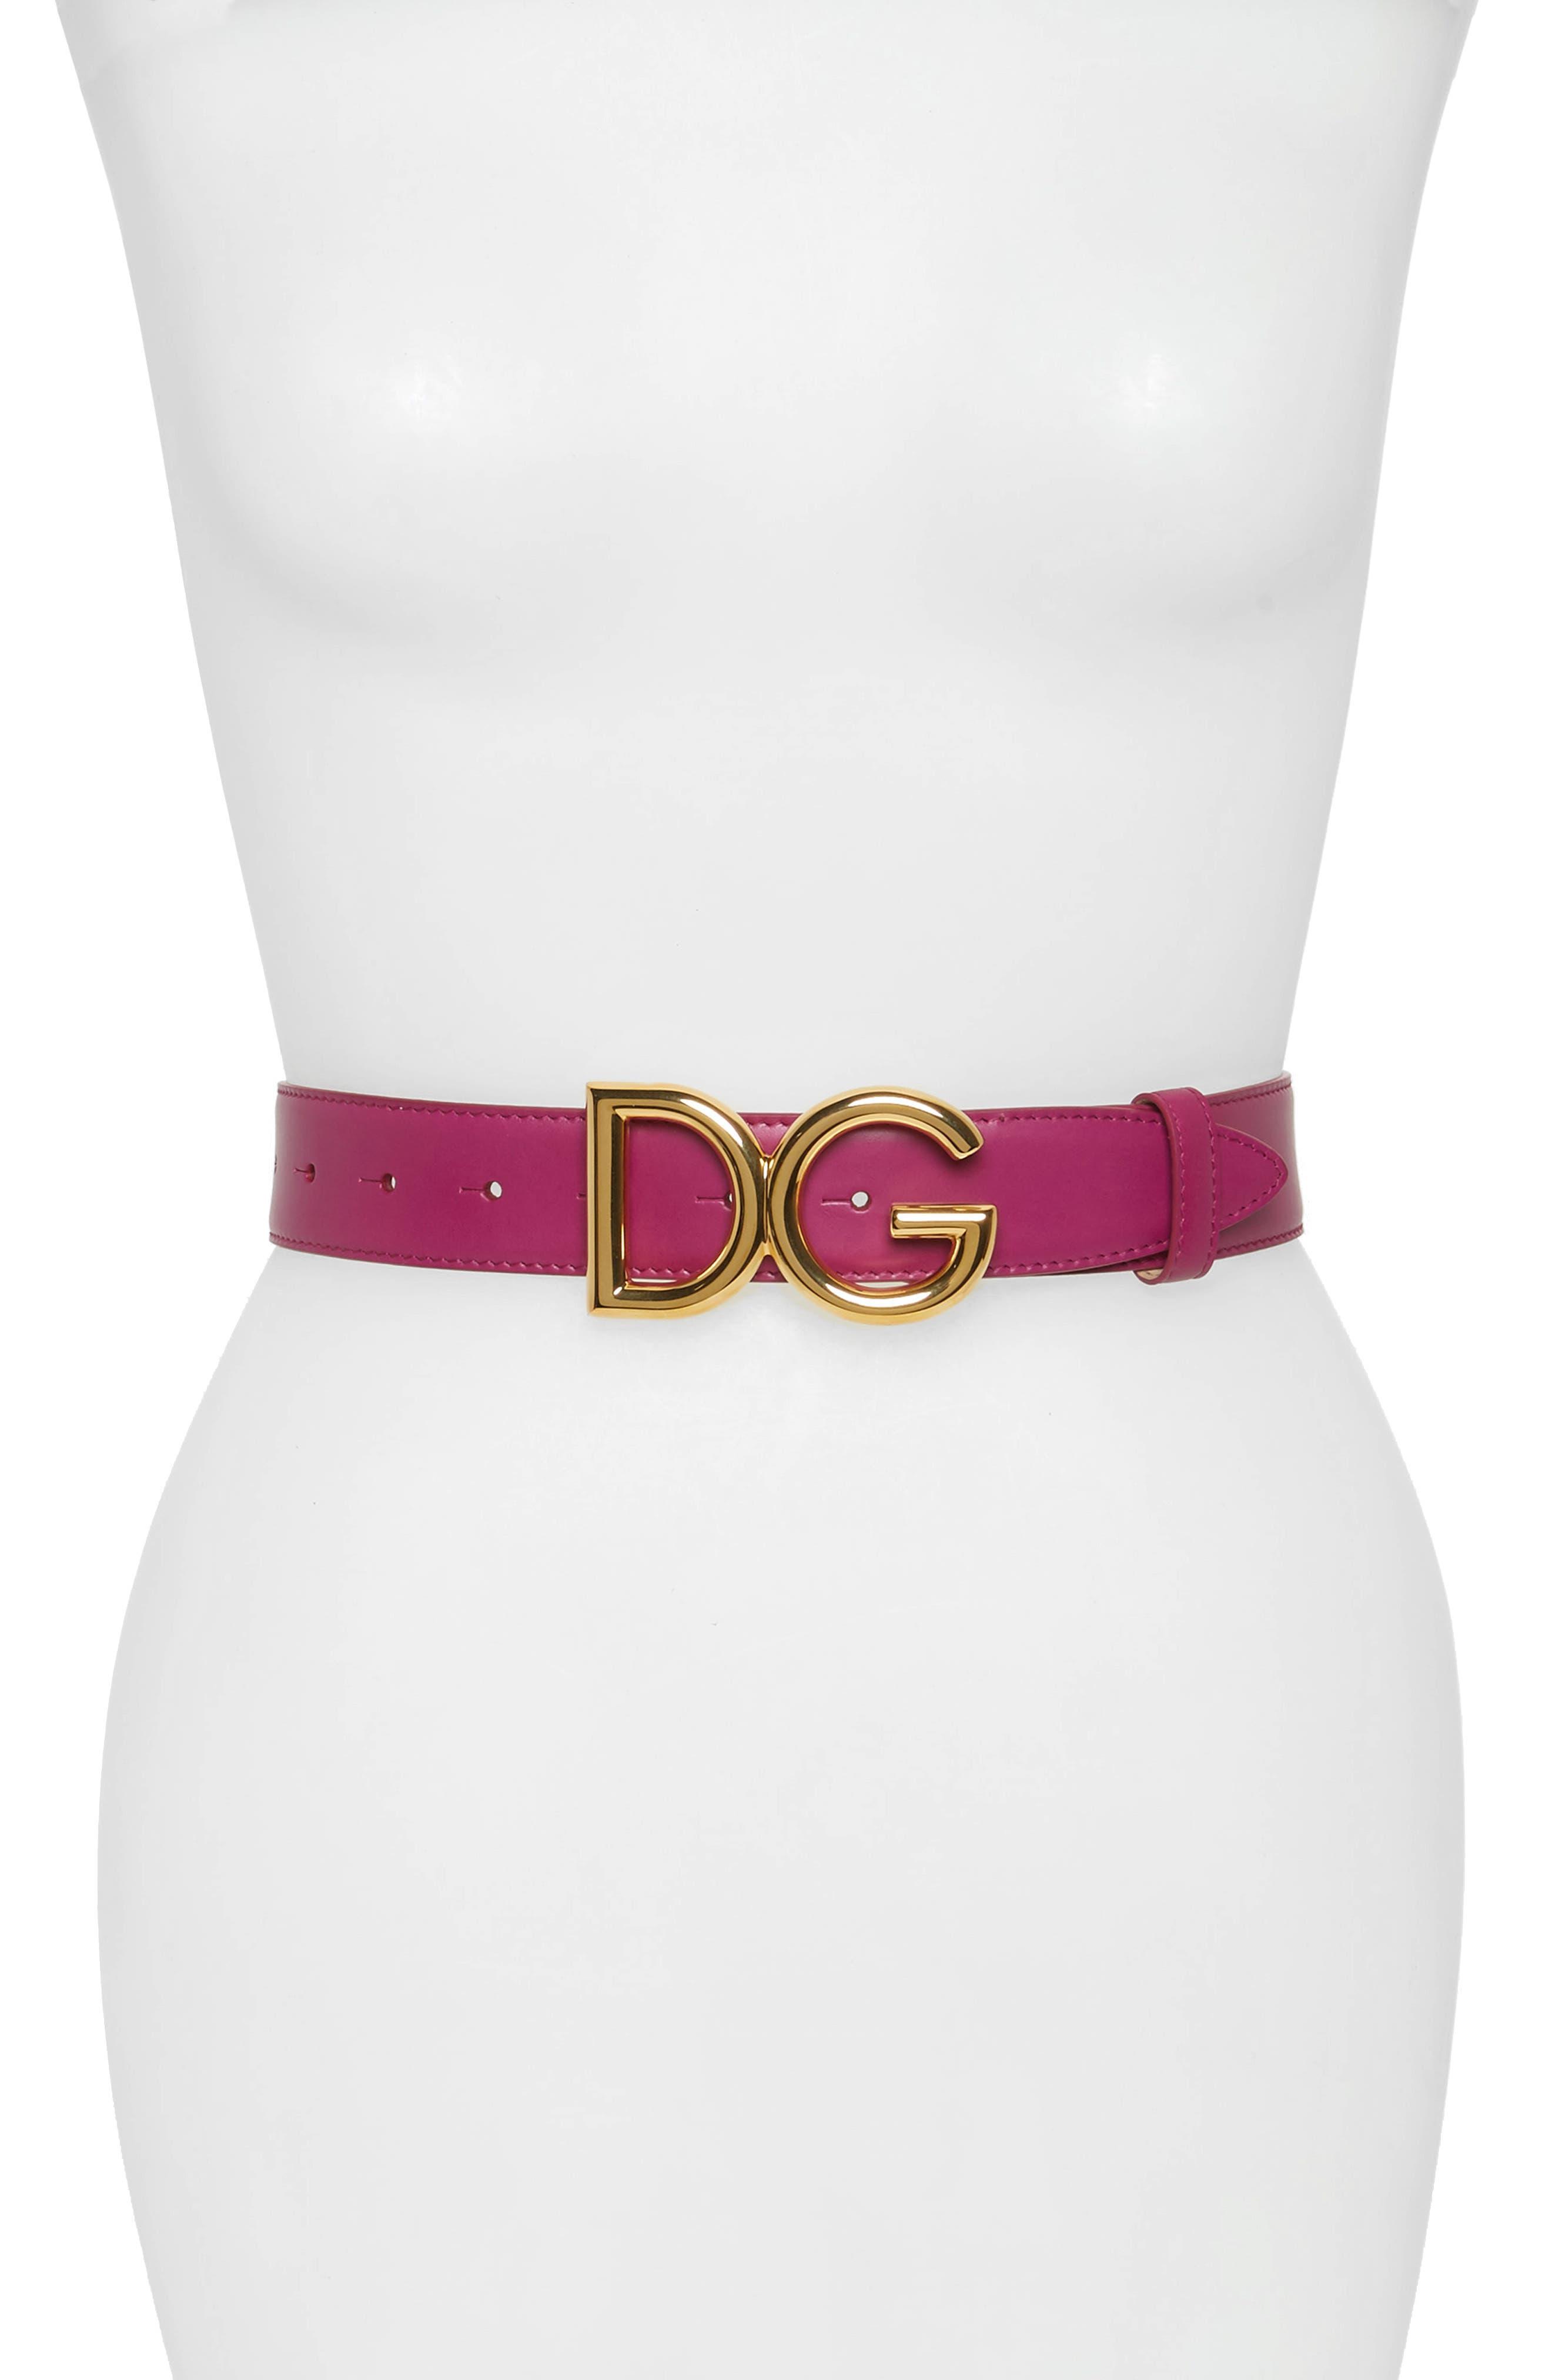 Dolce & gabbana Family Lux Metal Logo Buckle Leather Belt, Orchidea/ Ottone